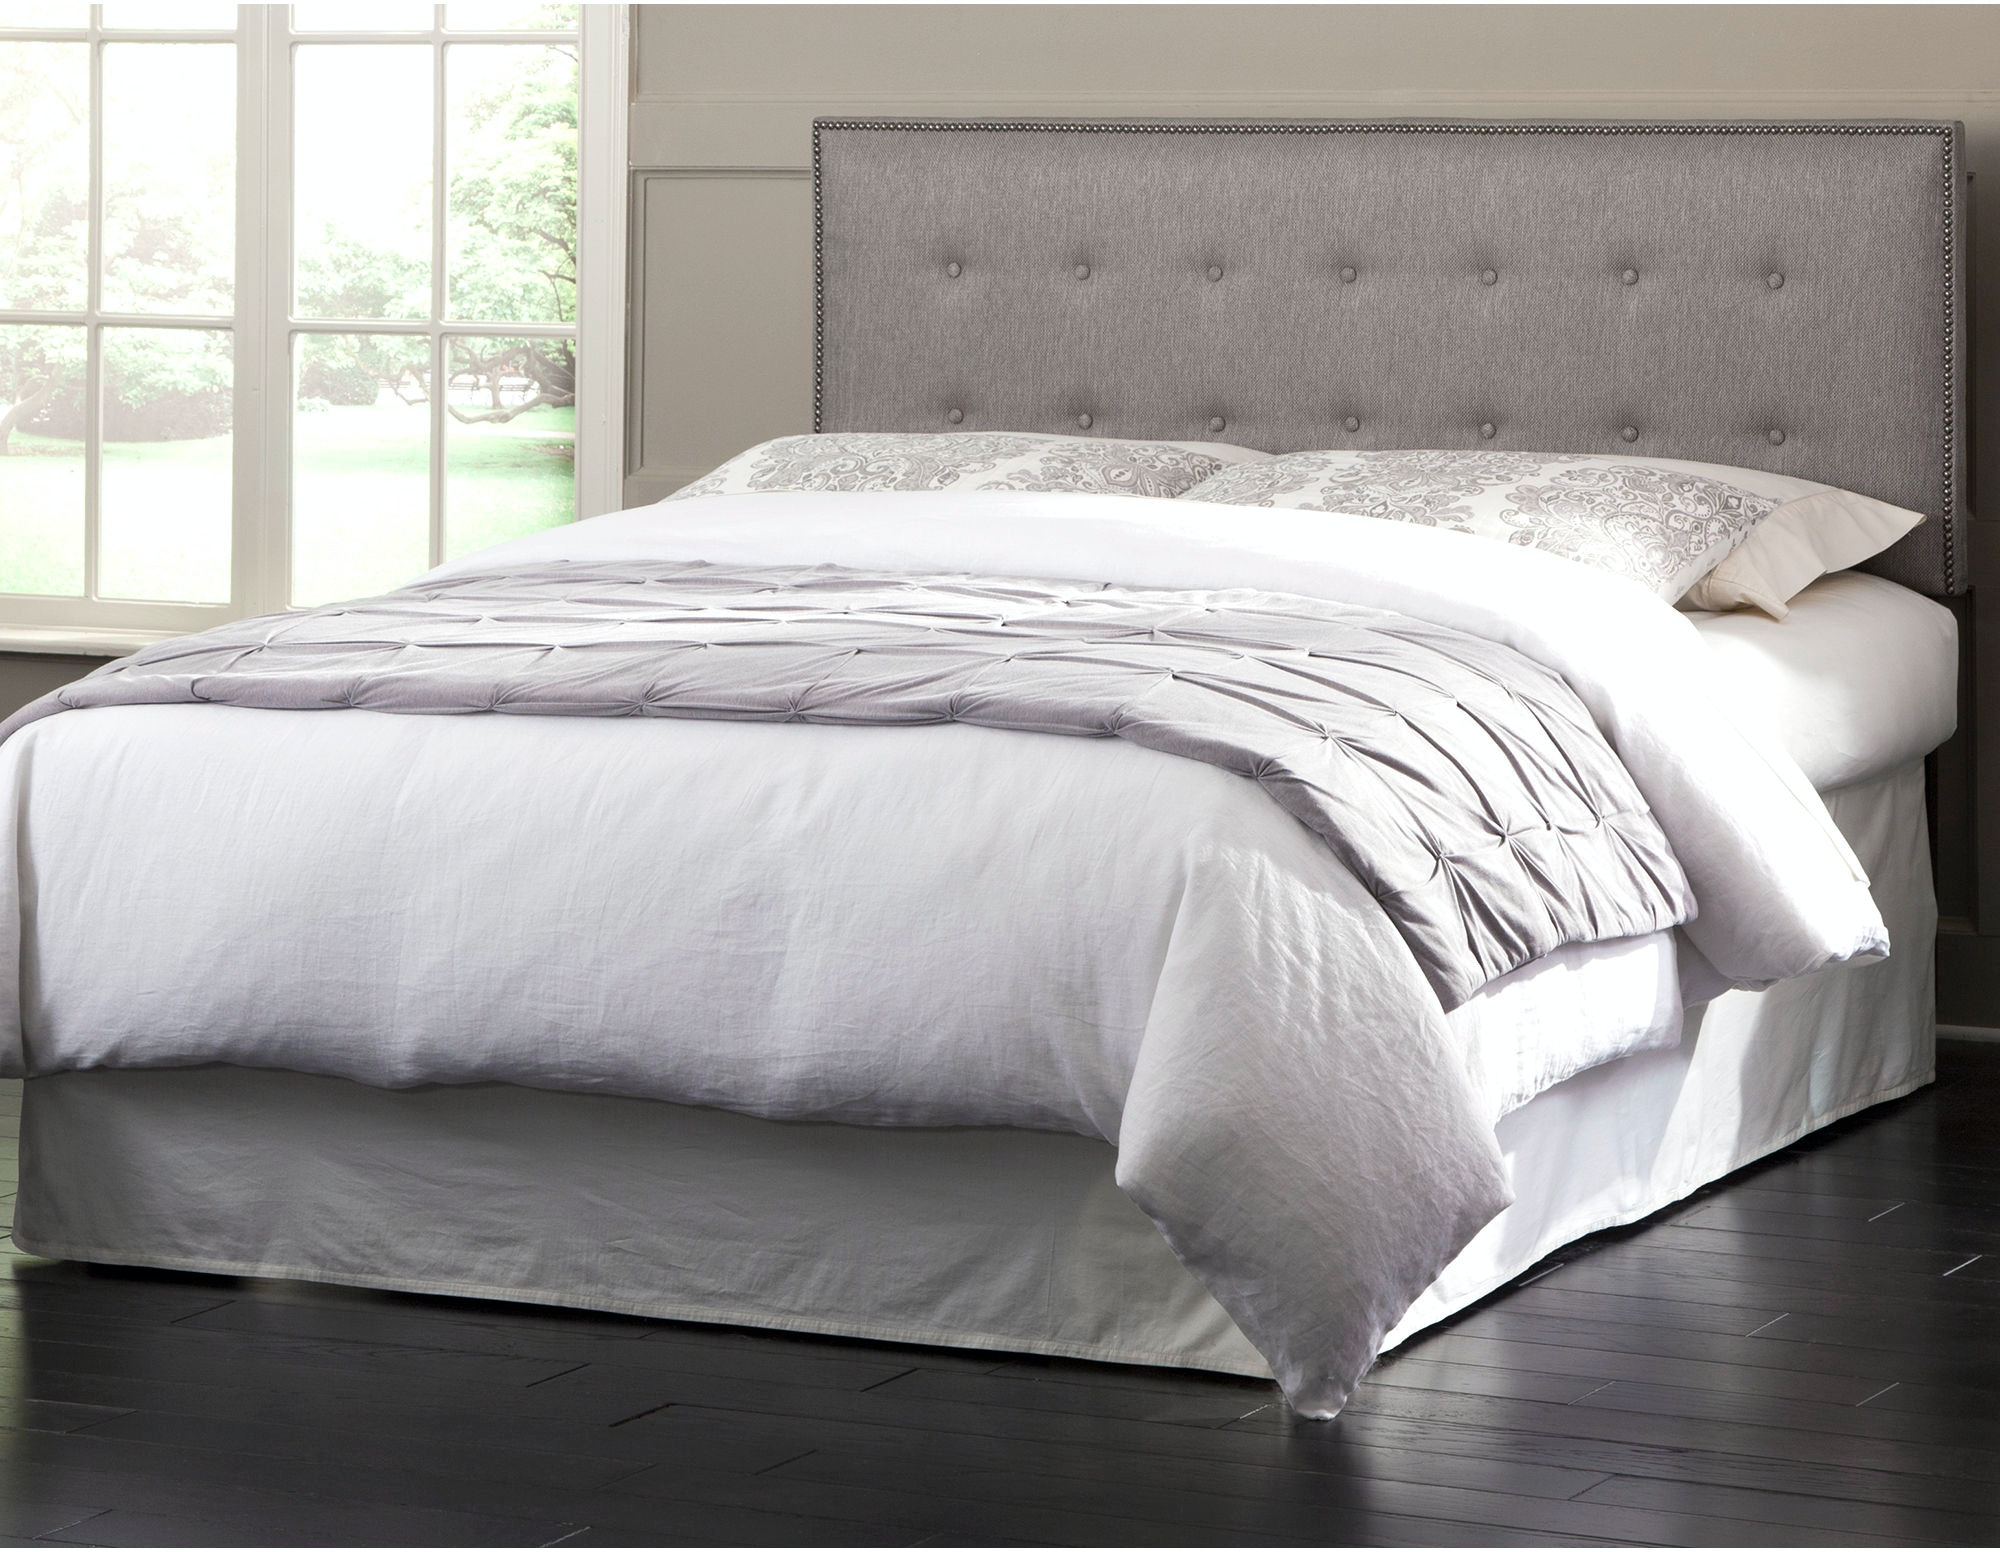 Wayfair Tufted Headboard Solid Tufted Dimensions Wood: Fashion Bed Group Bedroom Easley Upholstered Headboard